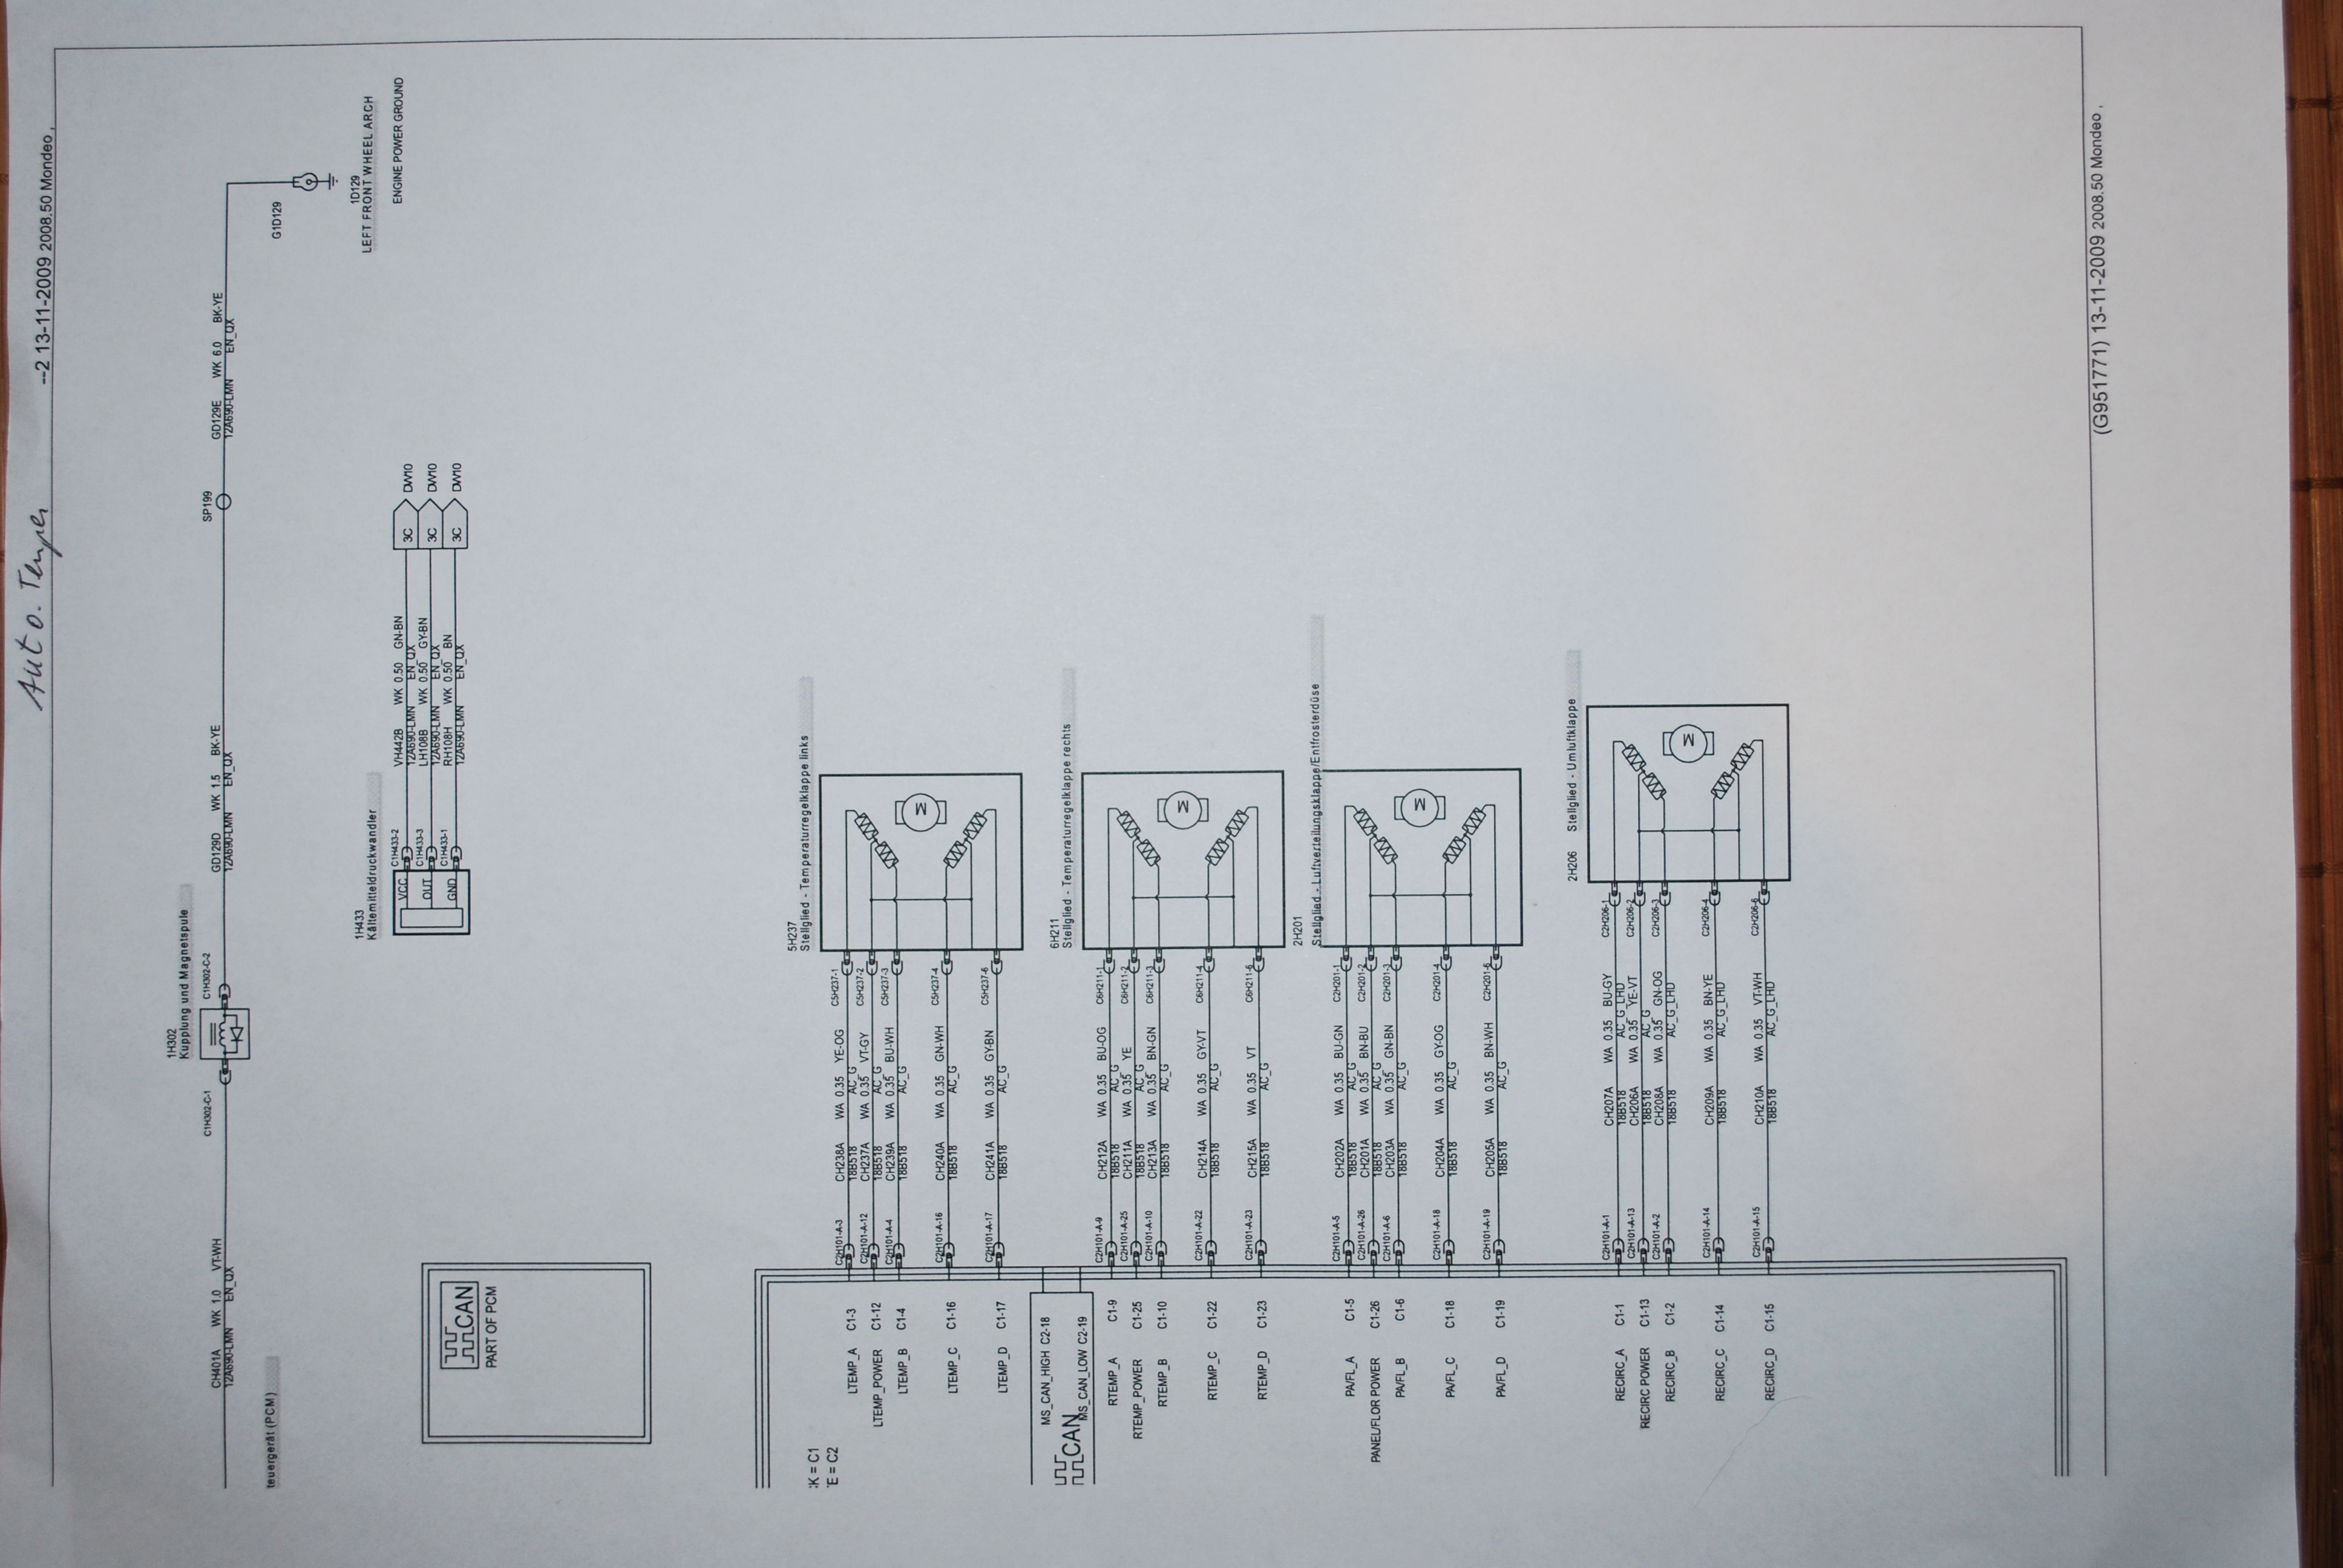 Berühmt Ford Mondeo Schaltplan Zeitgenössisch - Verdrahtungsideen ...